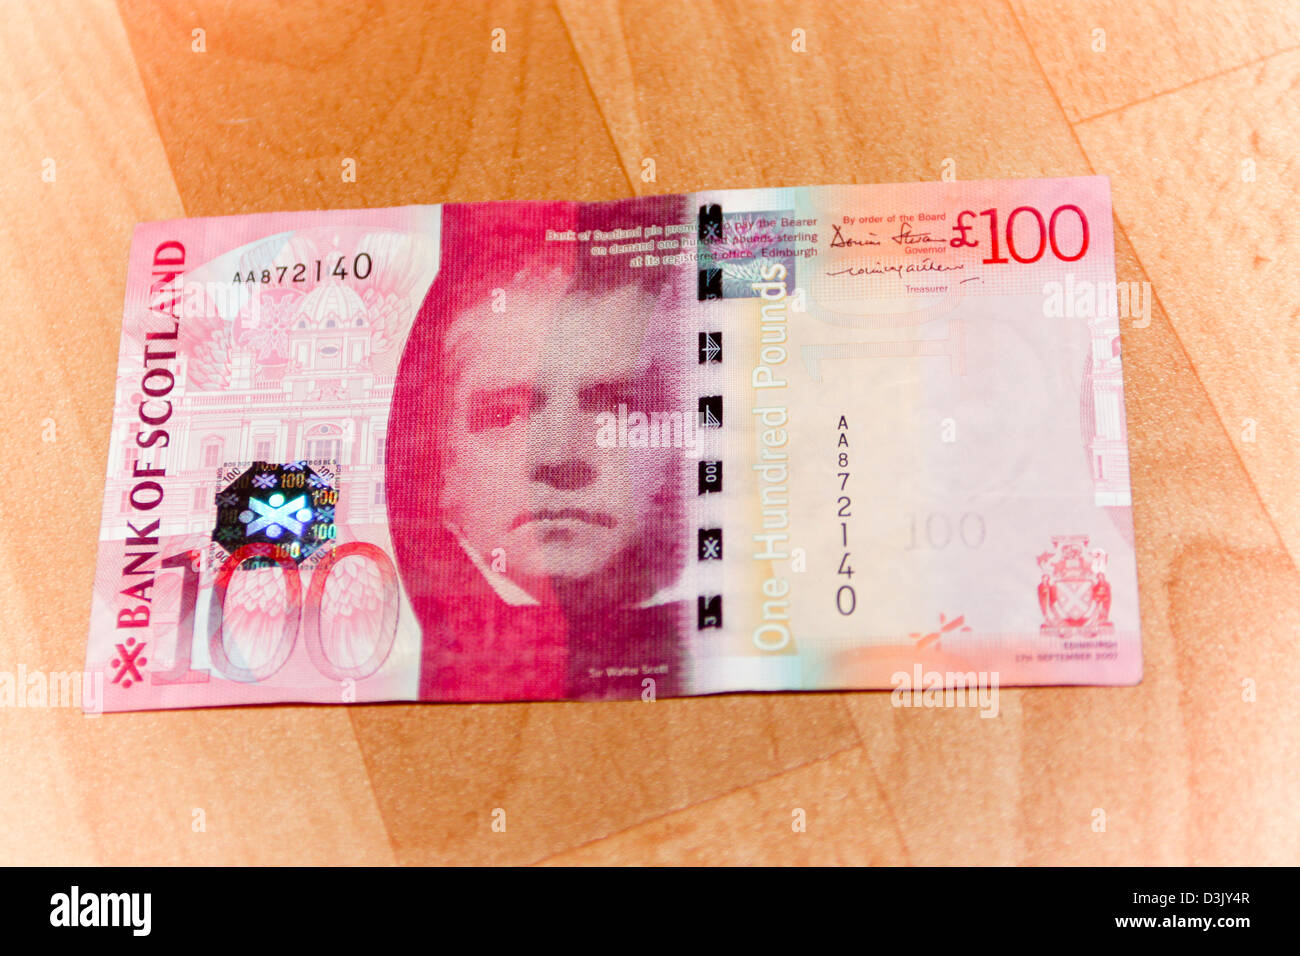 bank of scotland 163100 note stock photo royalty free image